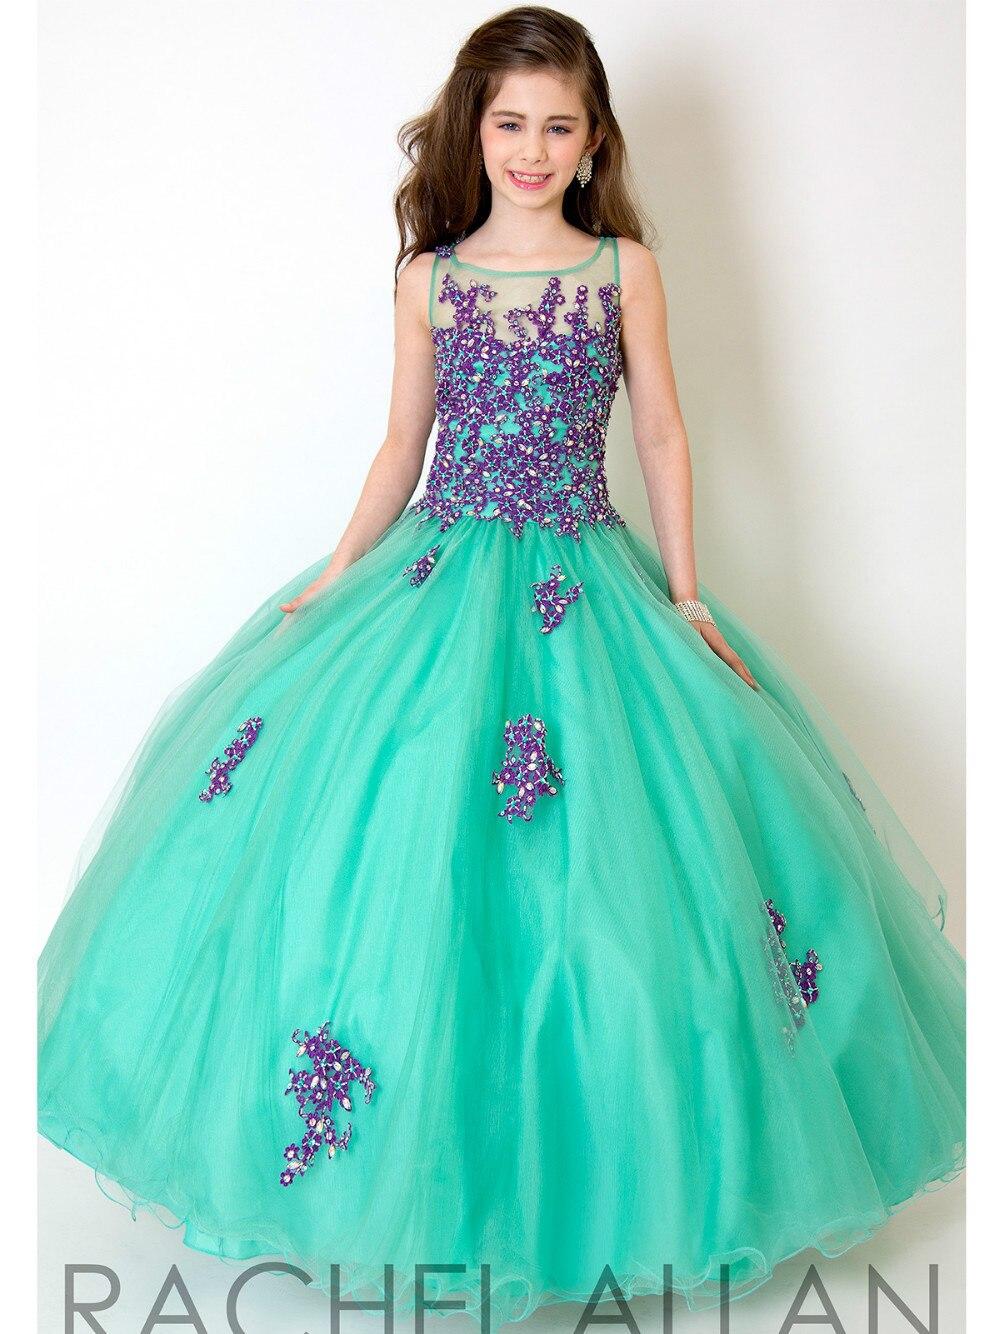 White Peach Blue Purple Lace Applique 2017 Little Girls Pageant Dress Floor  Length Tulle Flower Girls Dresses For Weddings-in Flower Girl Dresses from  ... 94273f9120ac